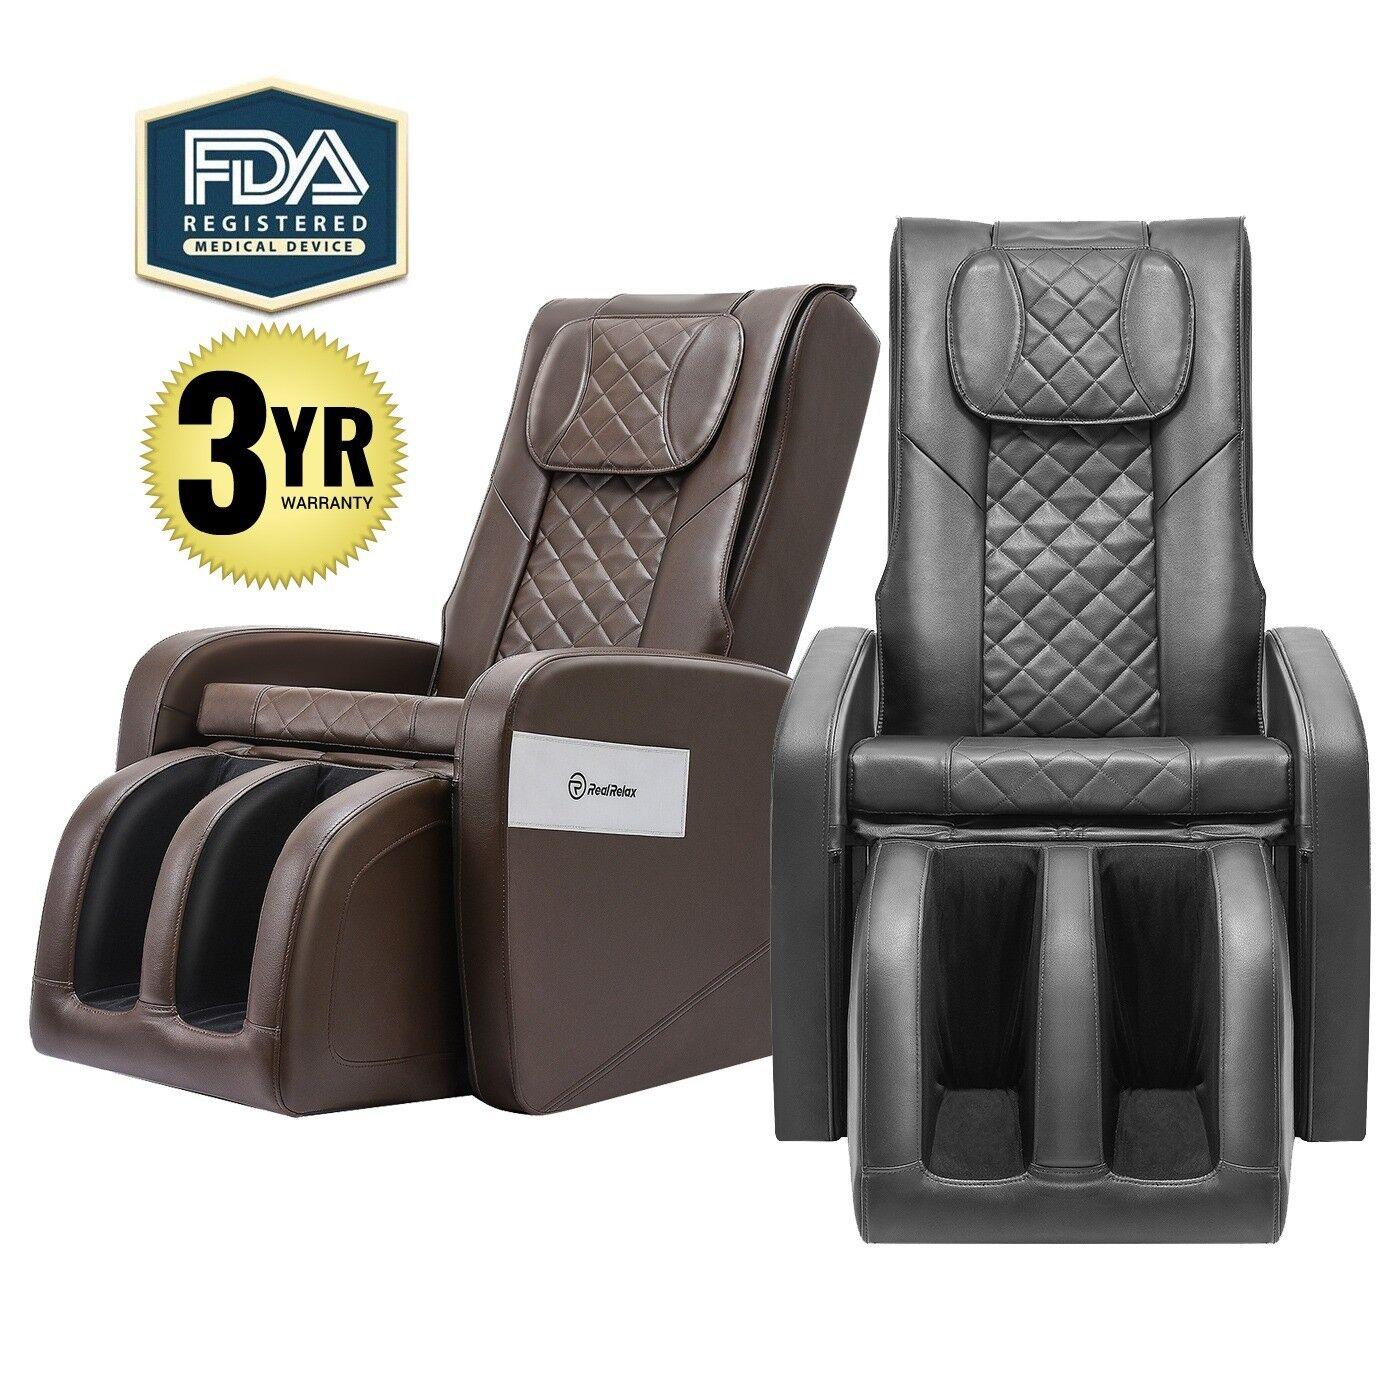 2019 Zero Gravity Massage Chair **3yr Warranty**. Full Body